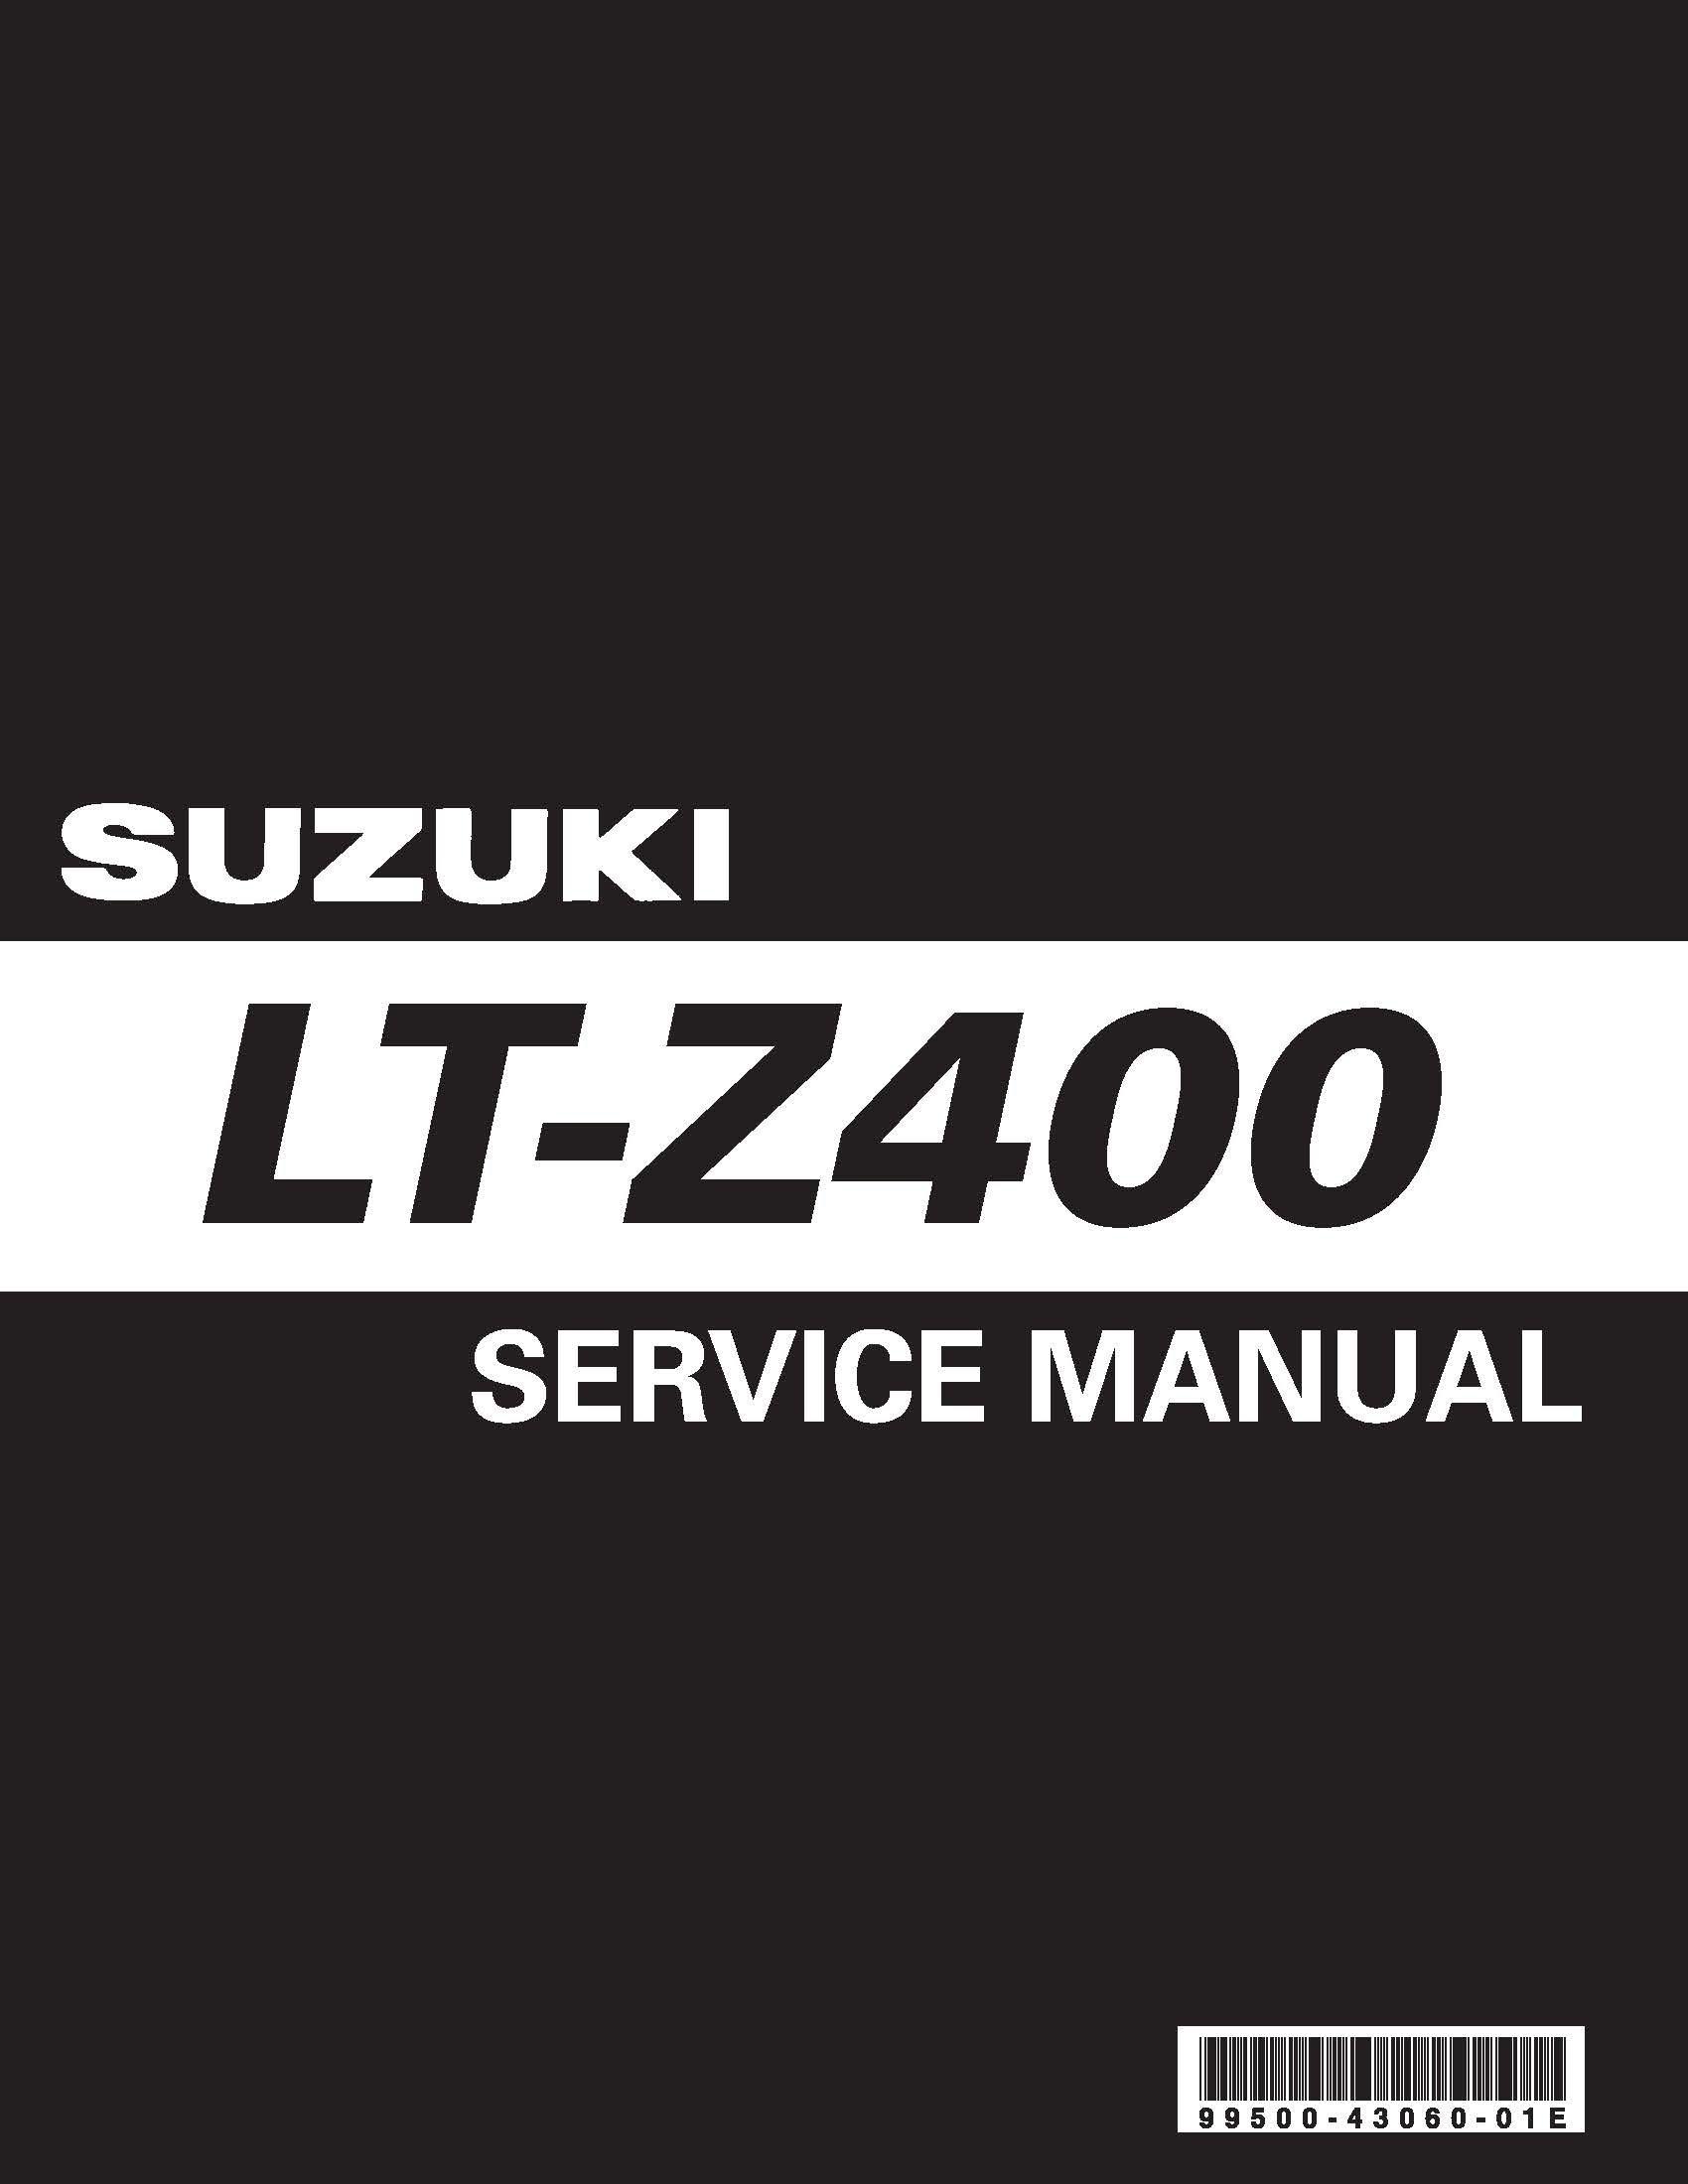 ... Array - rca j25420 manual ebook rh rca j25420 manual ebook  spyderdesigns us